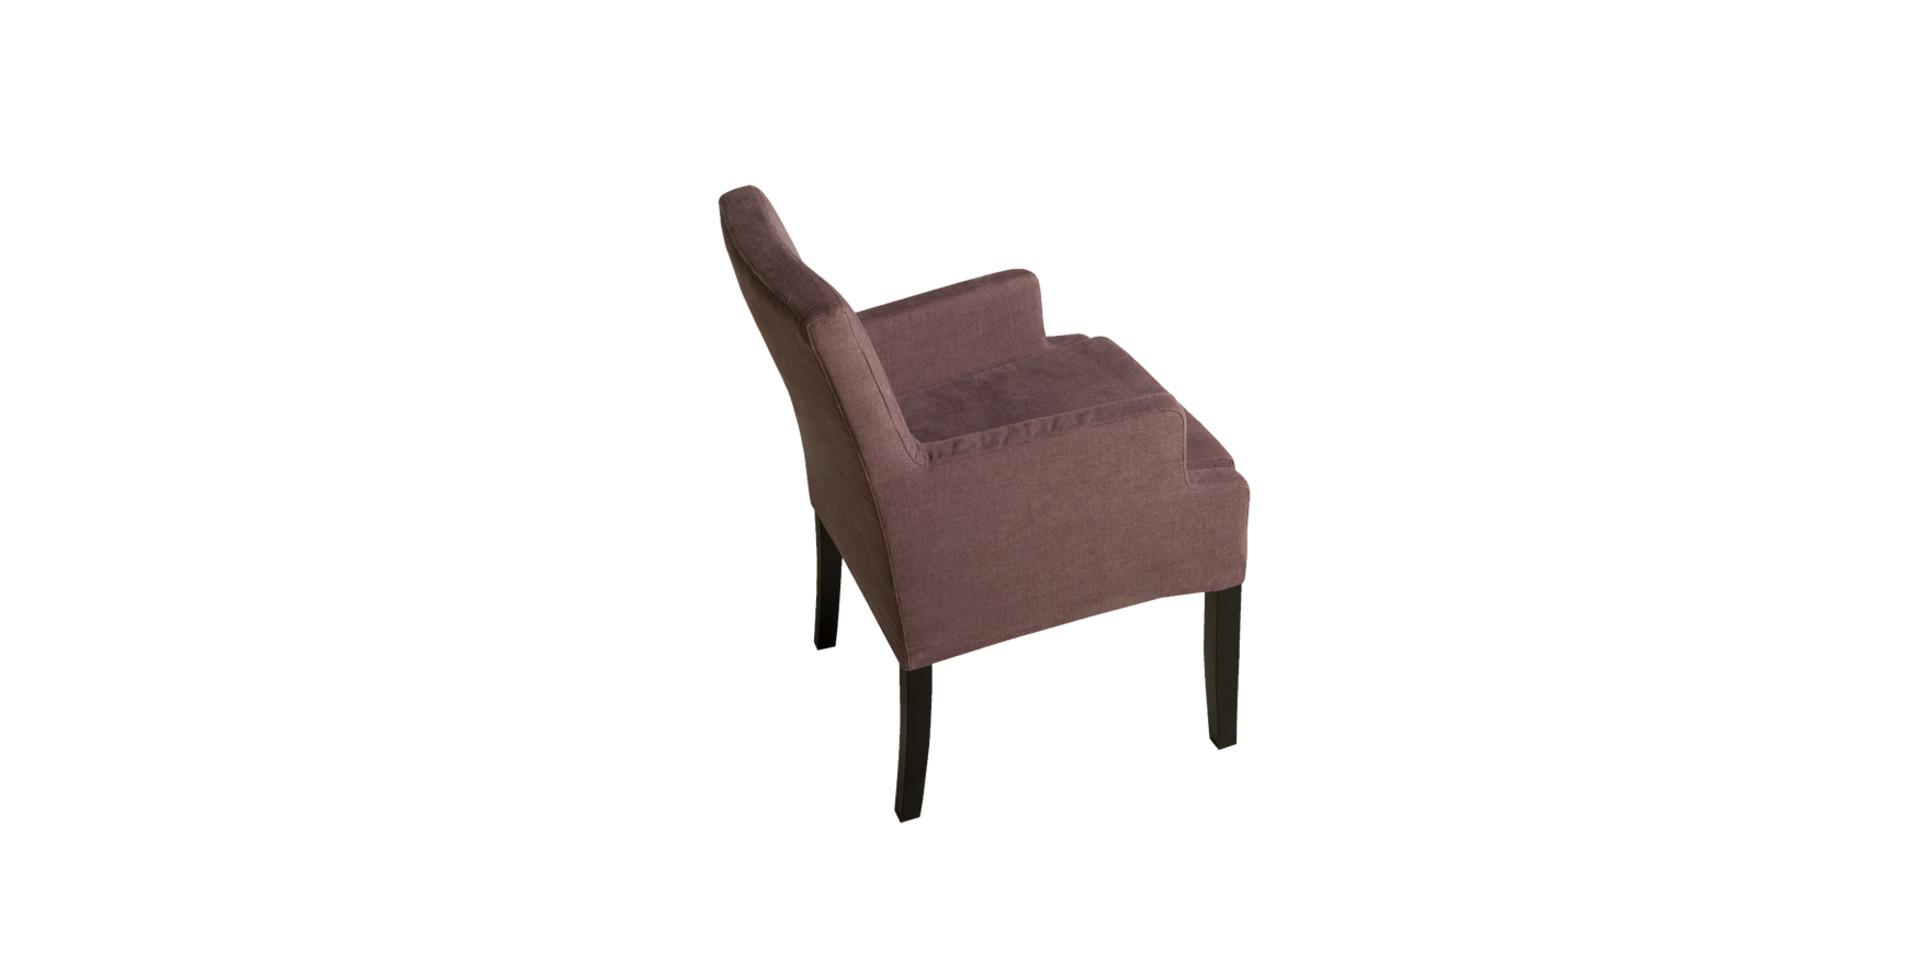 sits-merlin-fauteuil-chair_brest116_plum_6